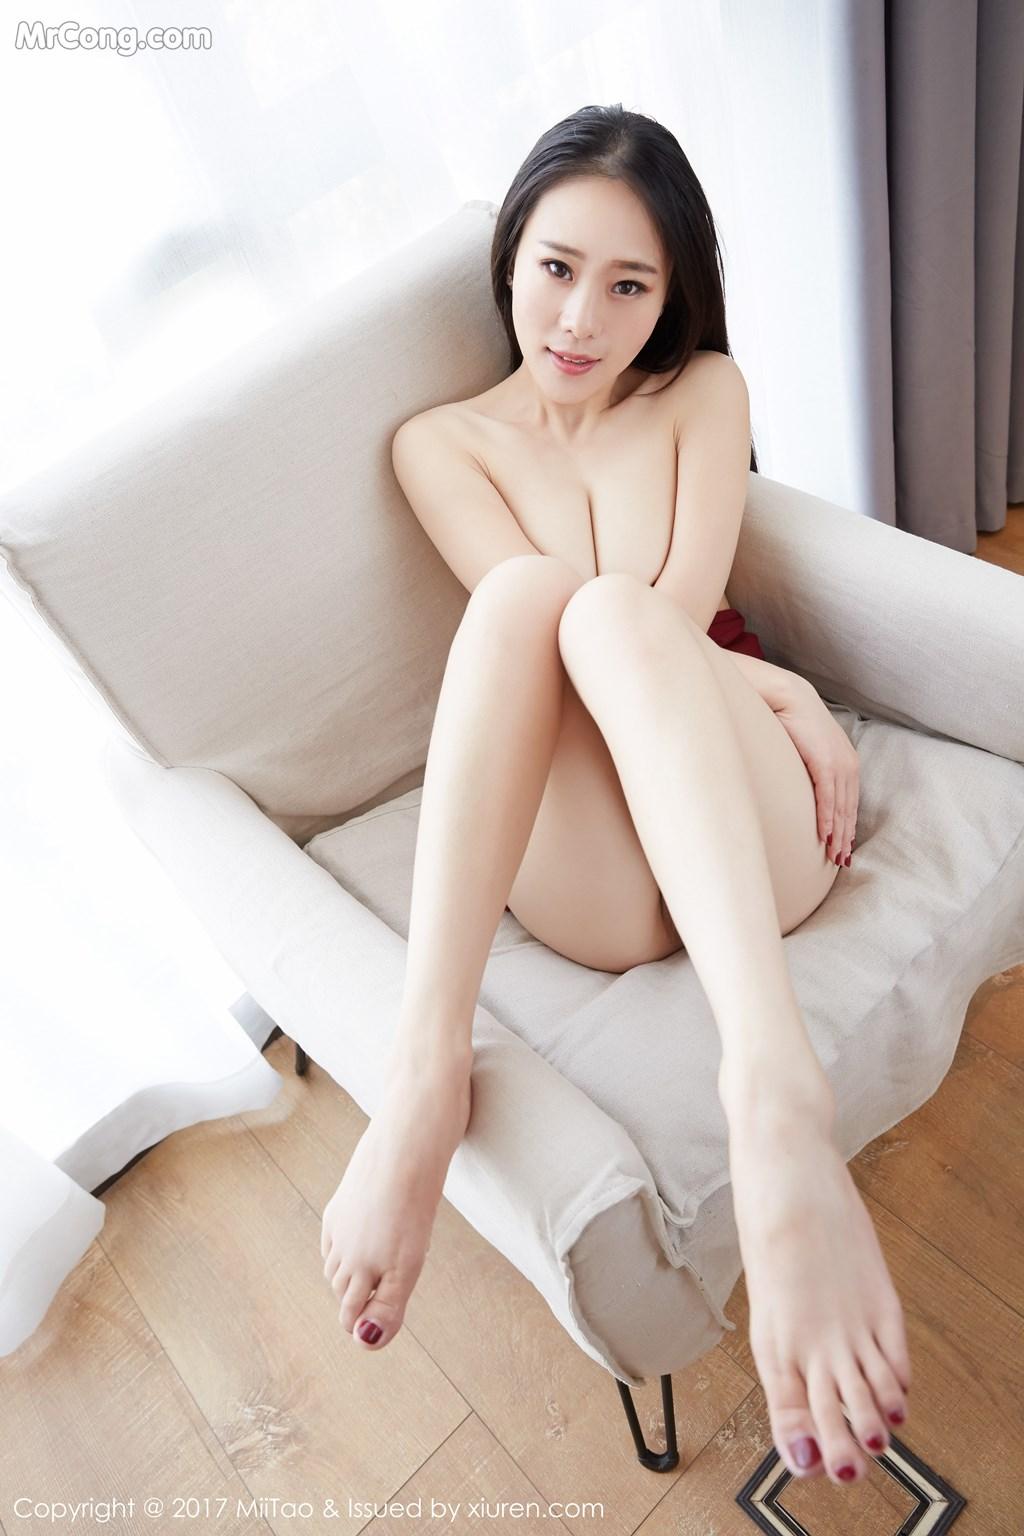 Image MiiTao-Vol.079-Yu-Wei-MrCong.com-038 in post MiiTao Vol.079: Người mẫu Yu Wei (雨薇) (54 ảnh)